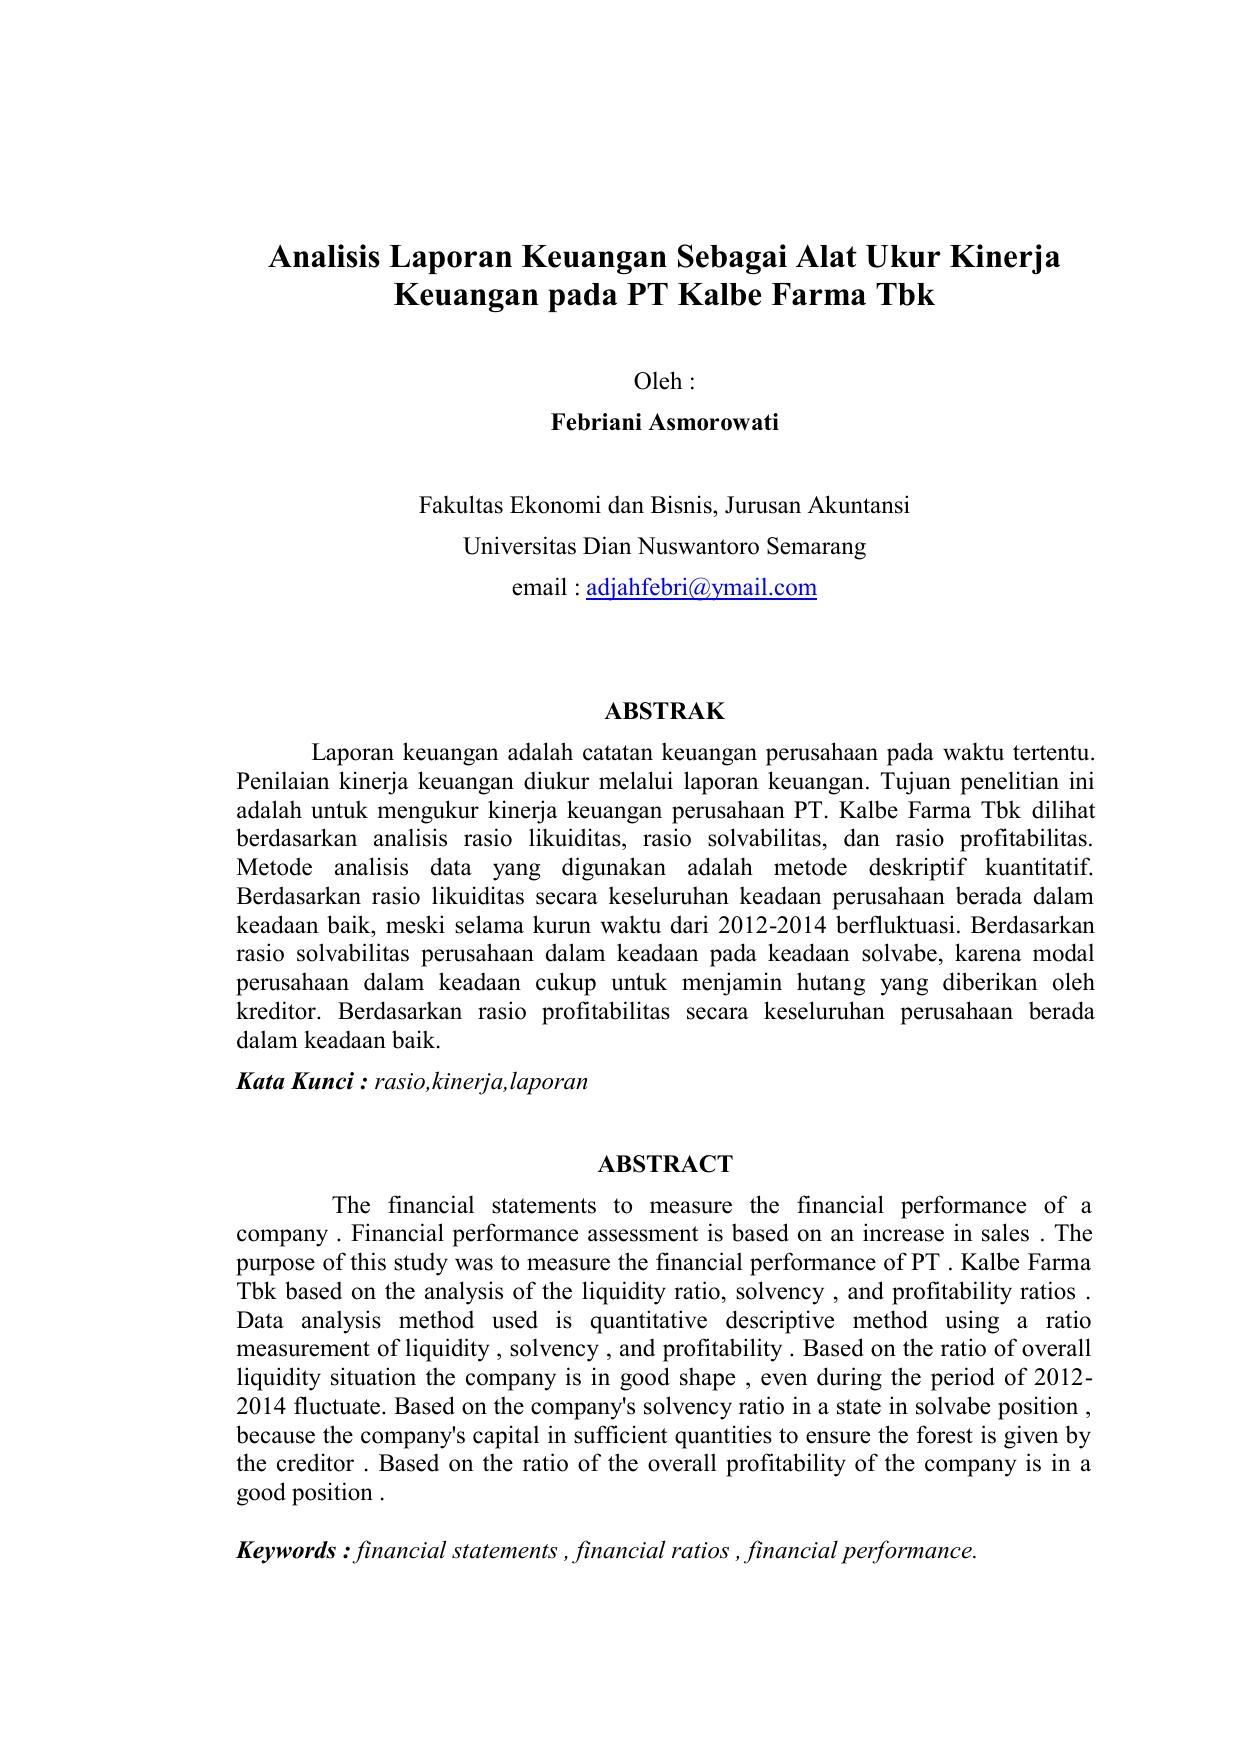 Analisis Laporan Keuangan Sebagai Alat Ukur Kinerja Keuangan